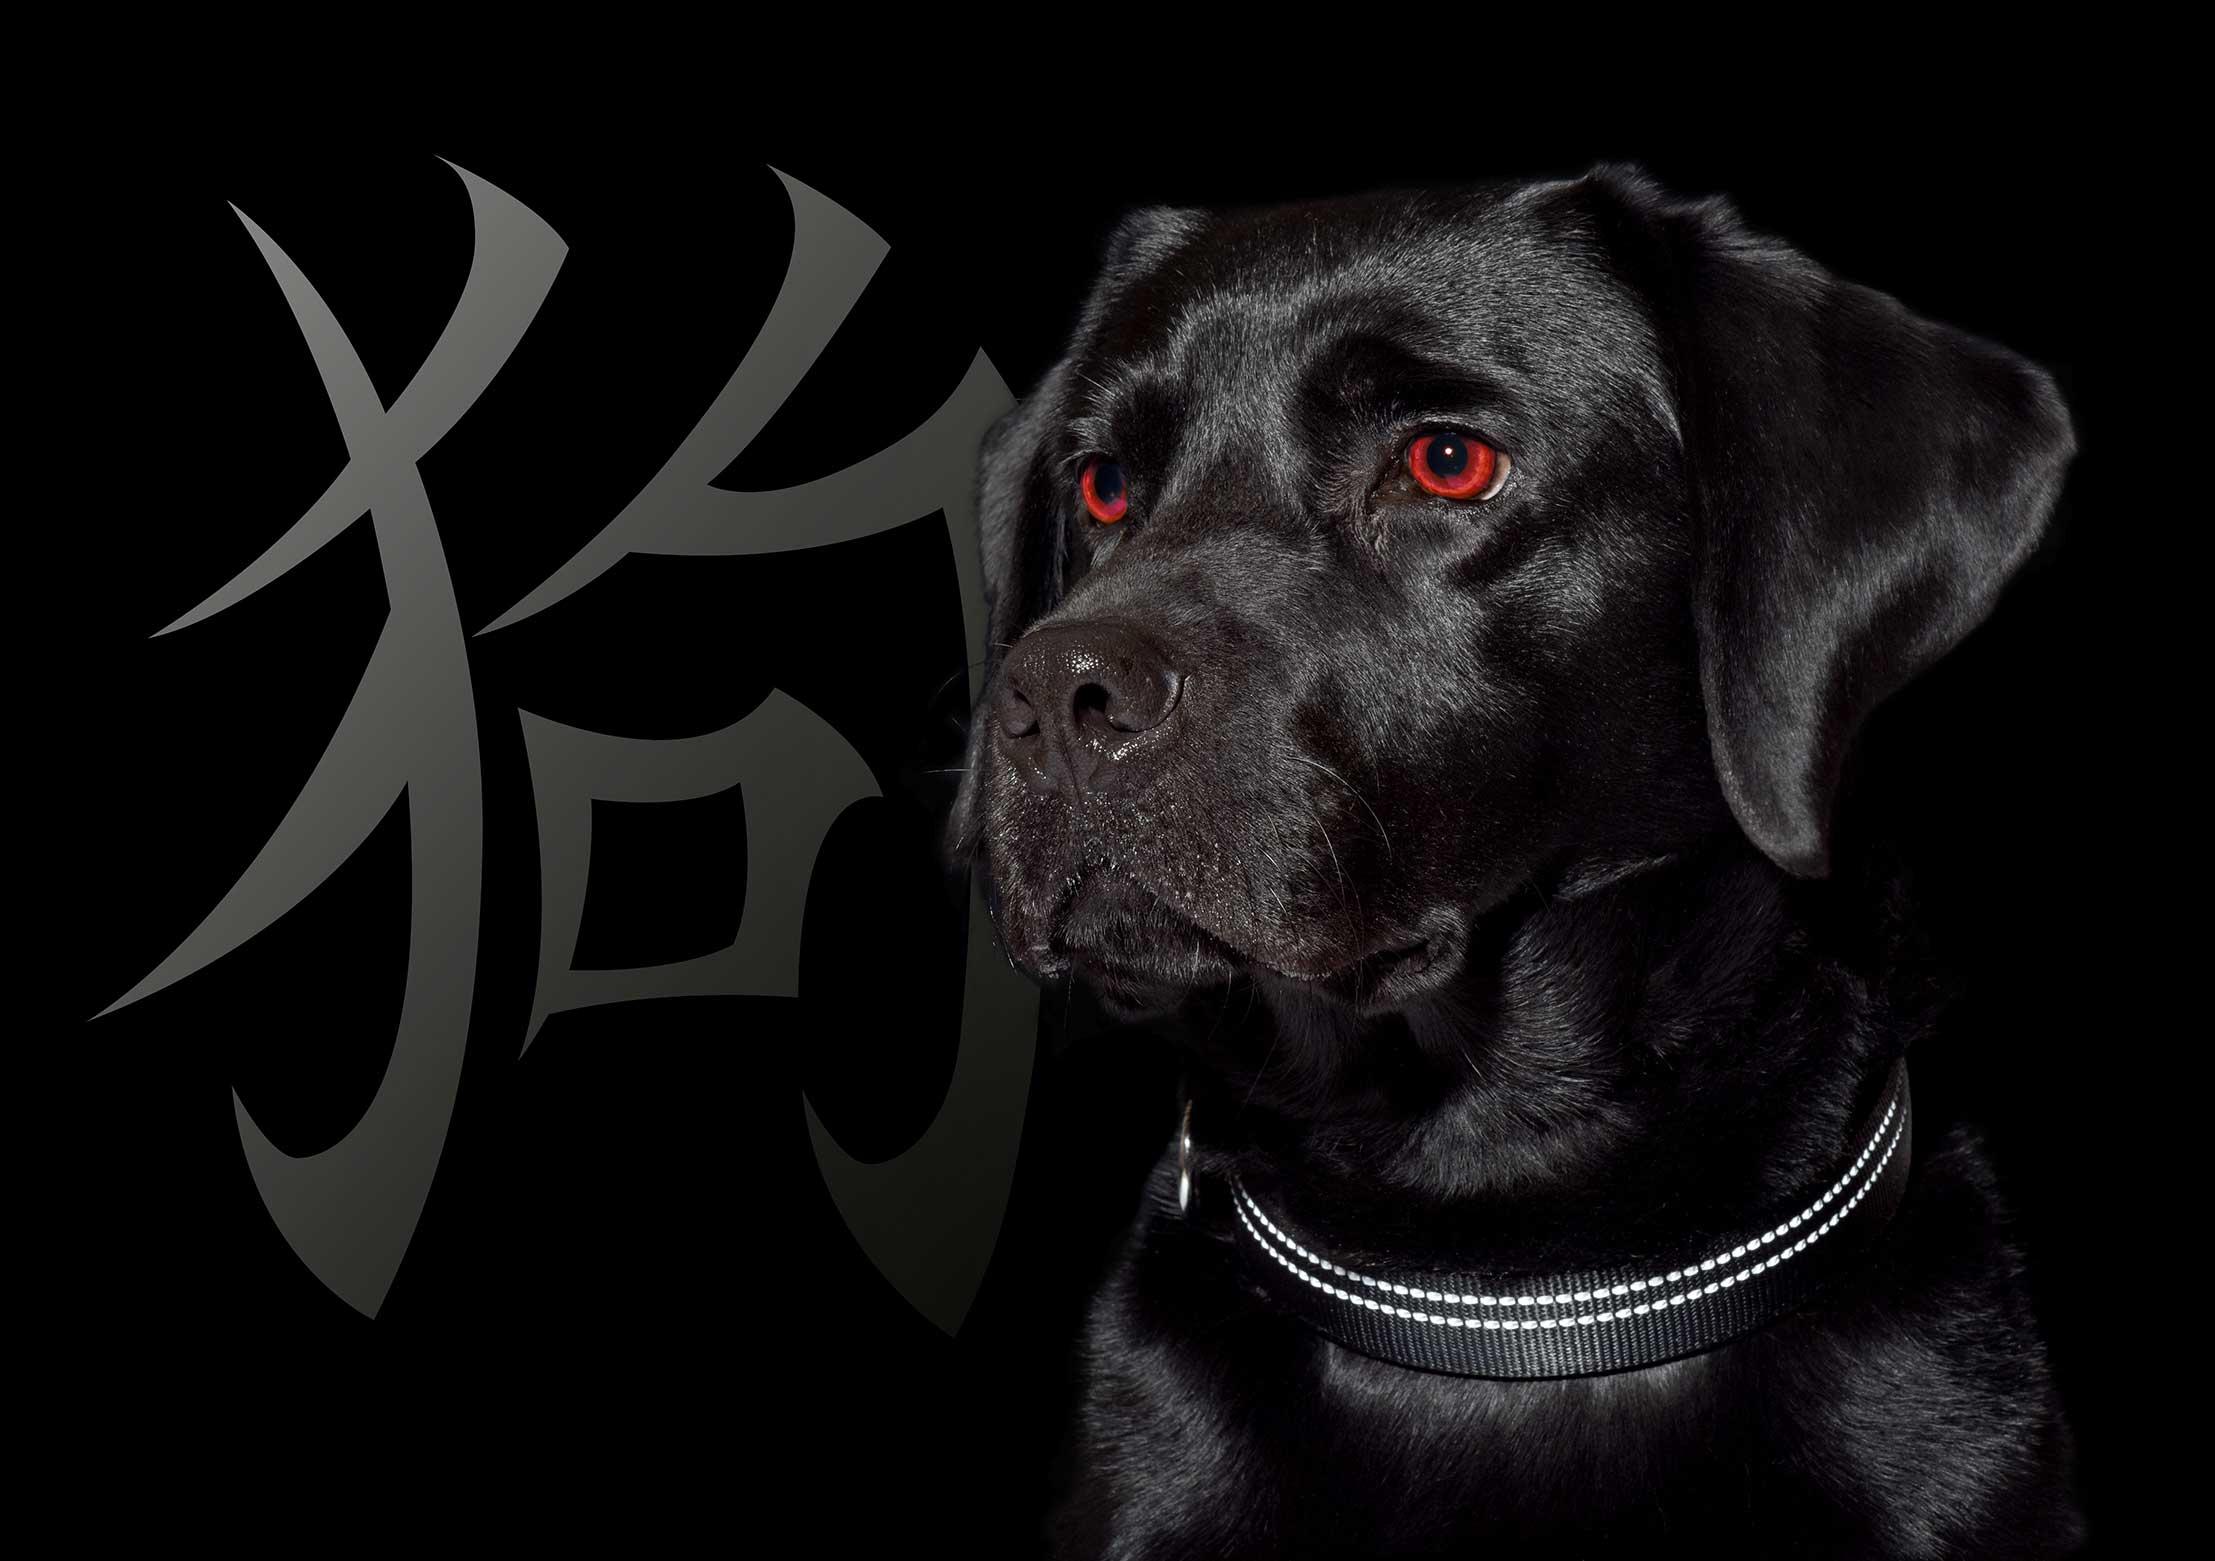 Black Labrador k9 dog